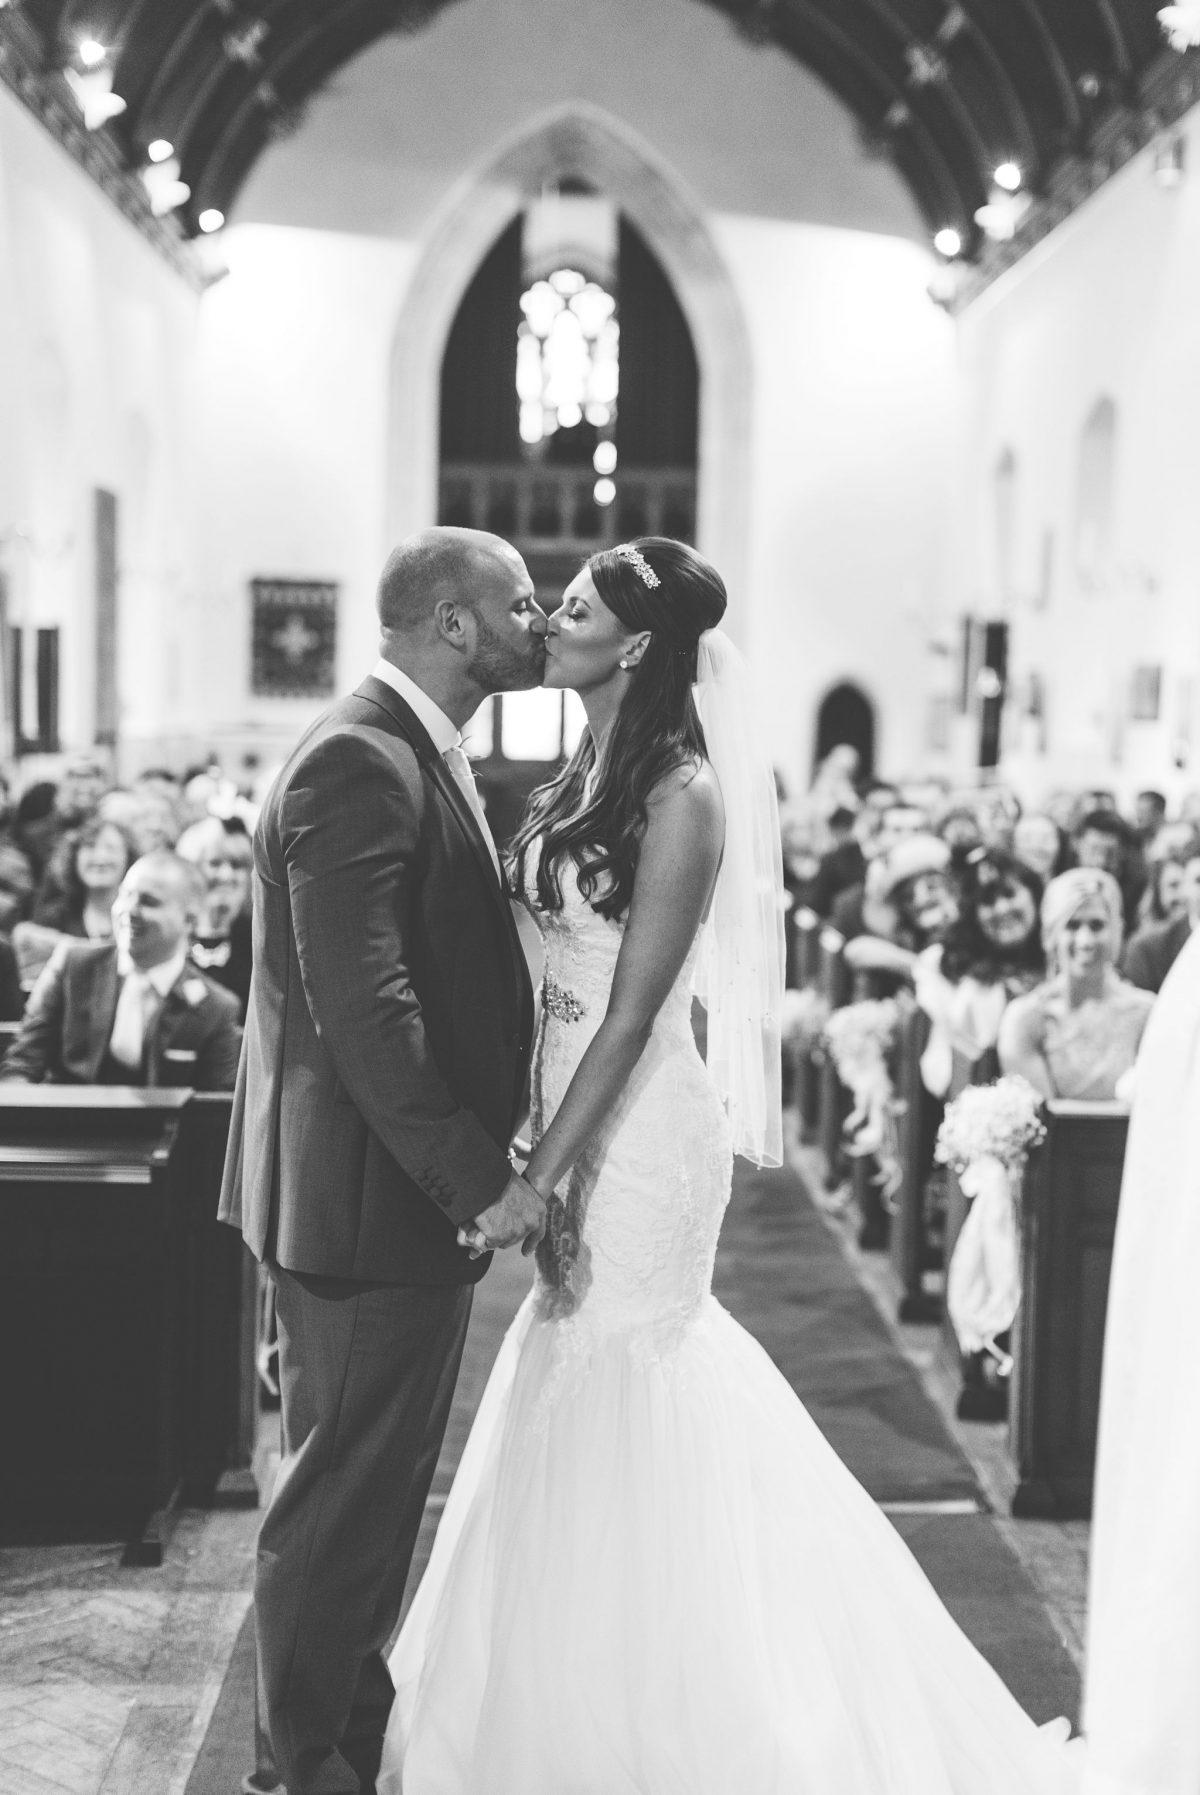 welsh_wedding_photographer_rachel_lambert_photography_decourceys_cardiff_rhiannon_gavin_ 28